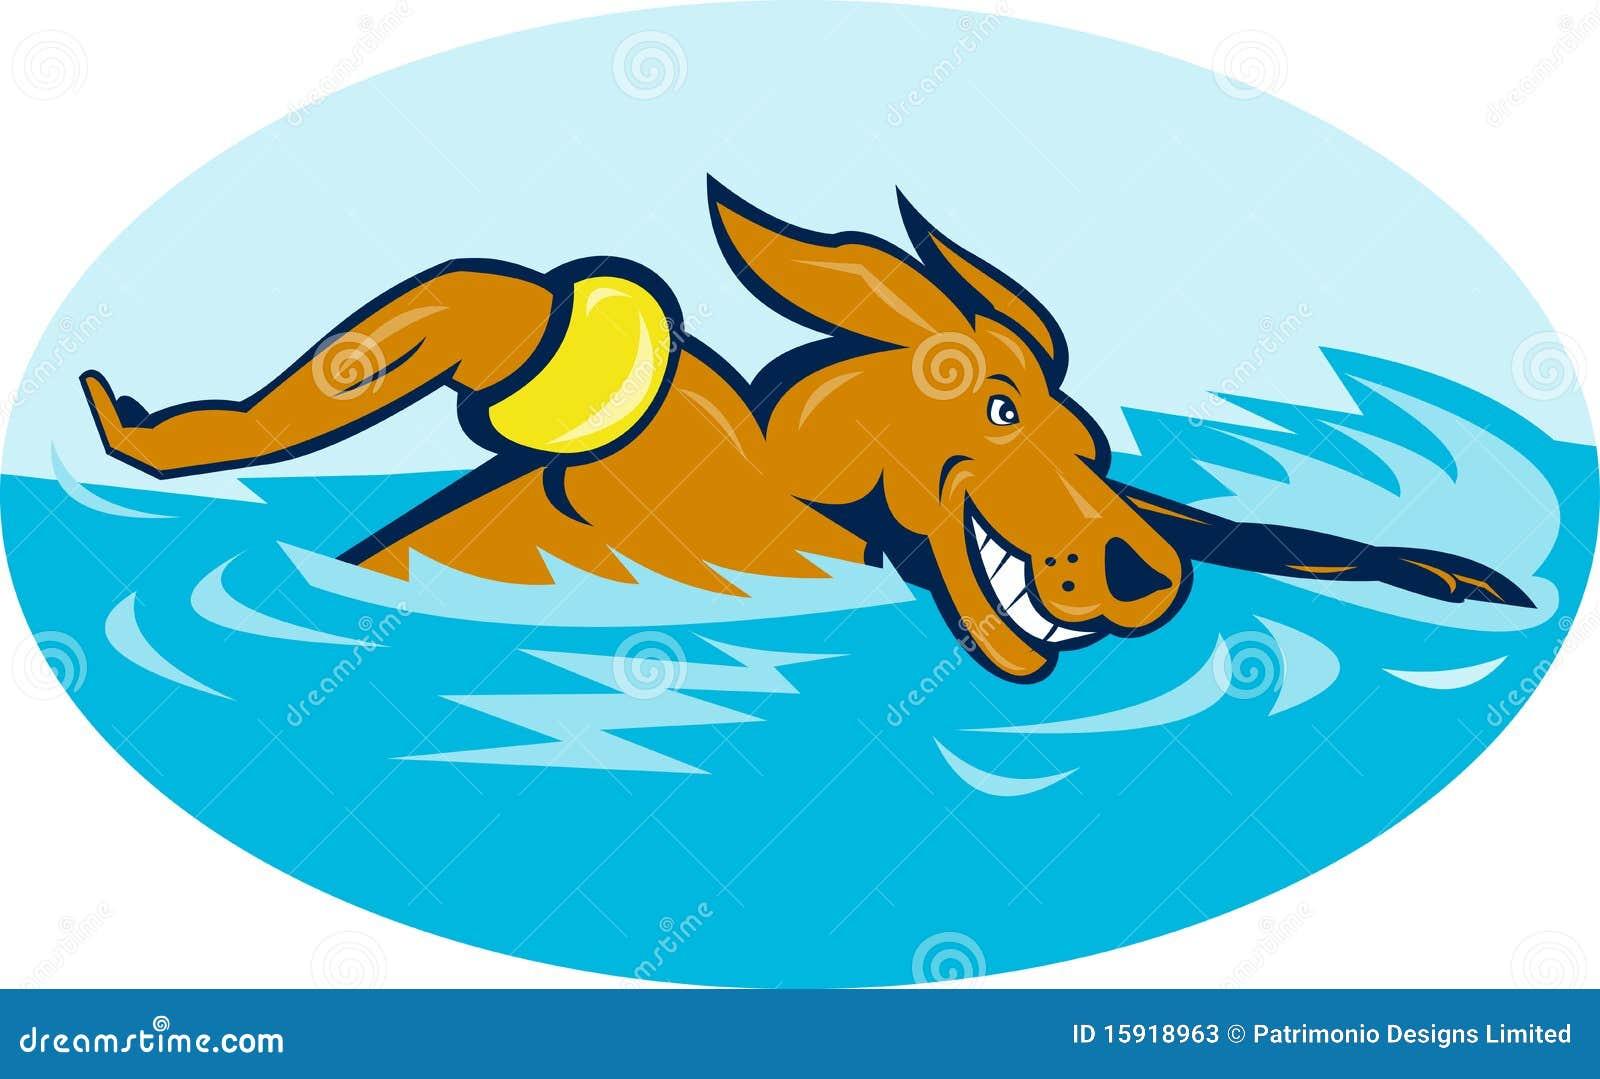 Cartoon Dog Swimming Stock Illustrations 404 Cartoon Dog Swimming Stock Illustrations Vectors Clipart Dreamstime